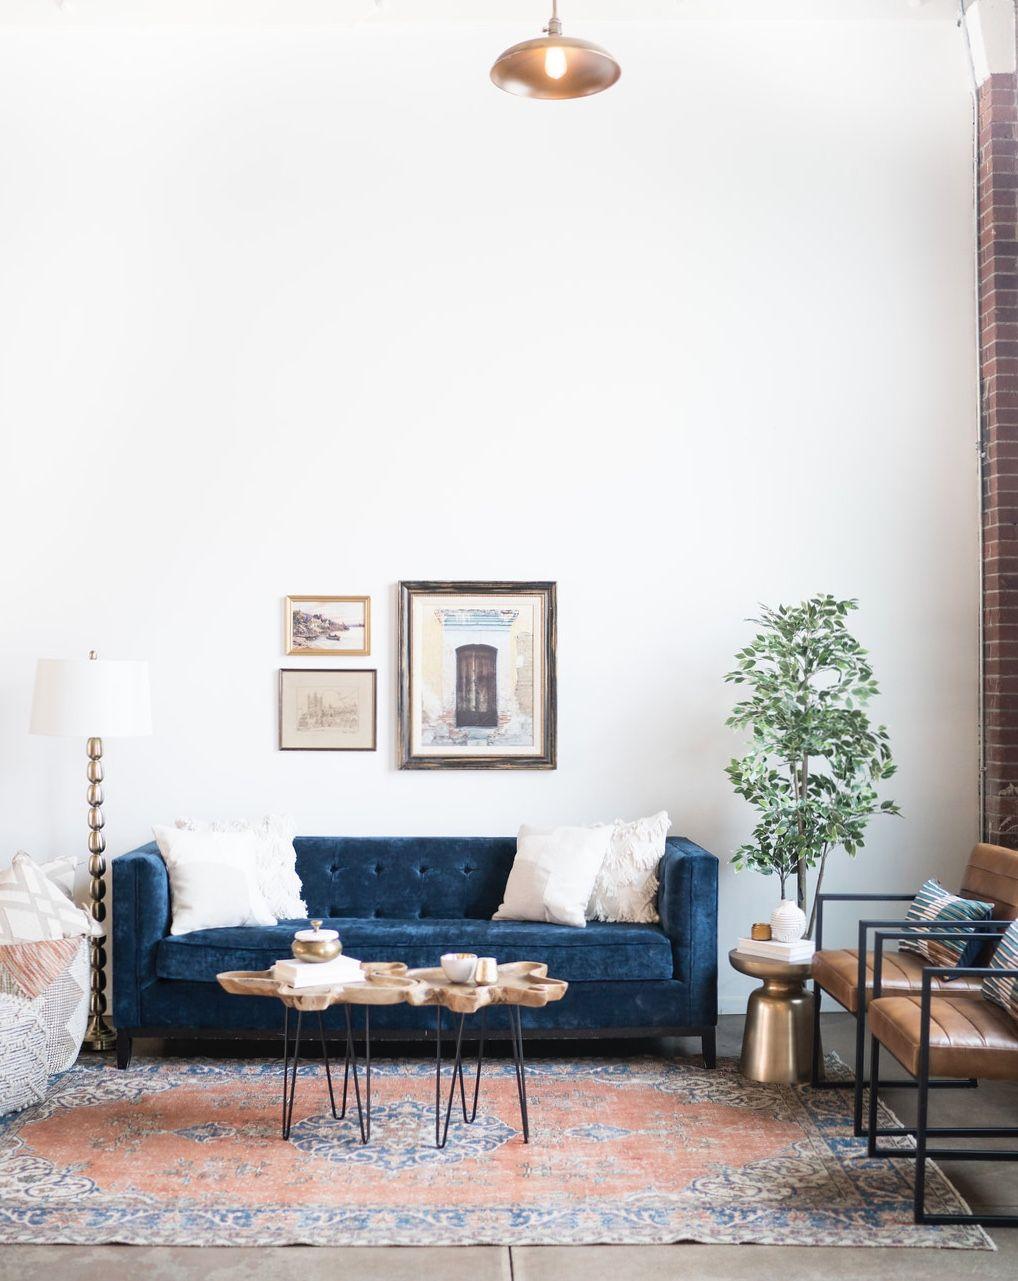 Best Colour Crush Terracotta And Navy Living Room Decor 400 x 300